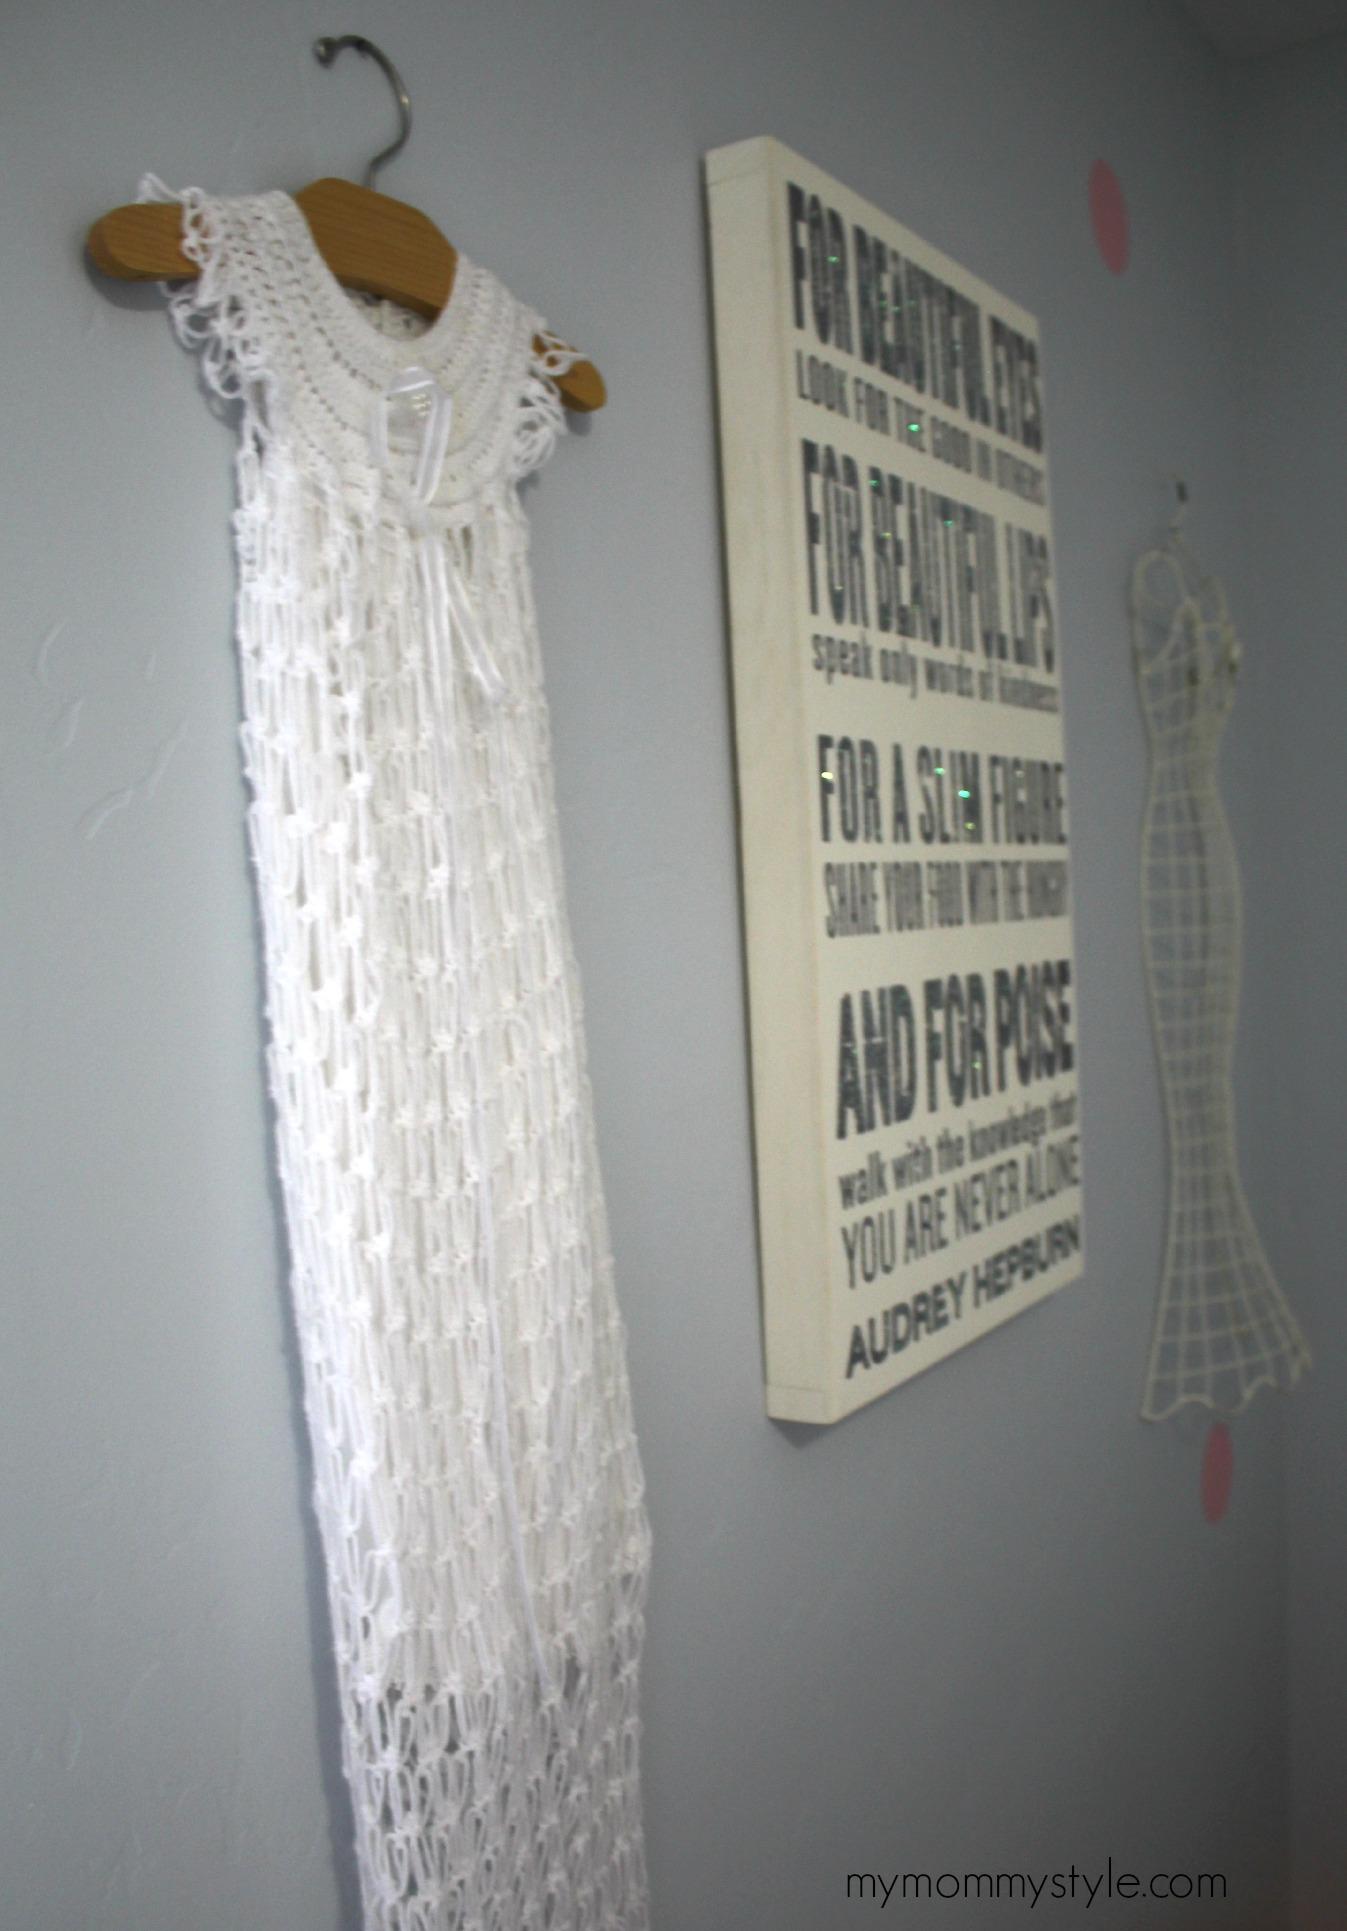 Audrey hepburn, little girls room, mymommystyle.com